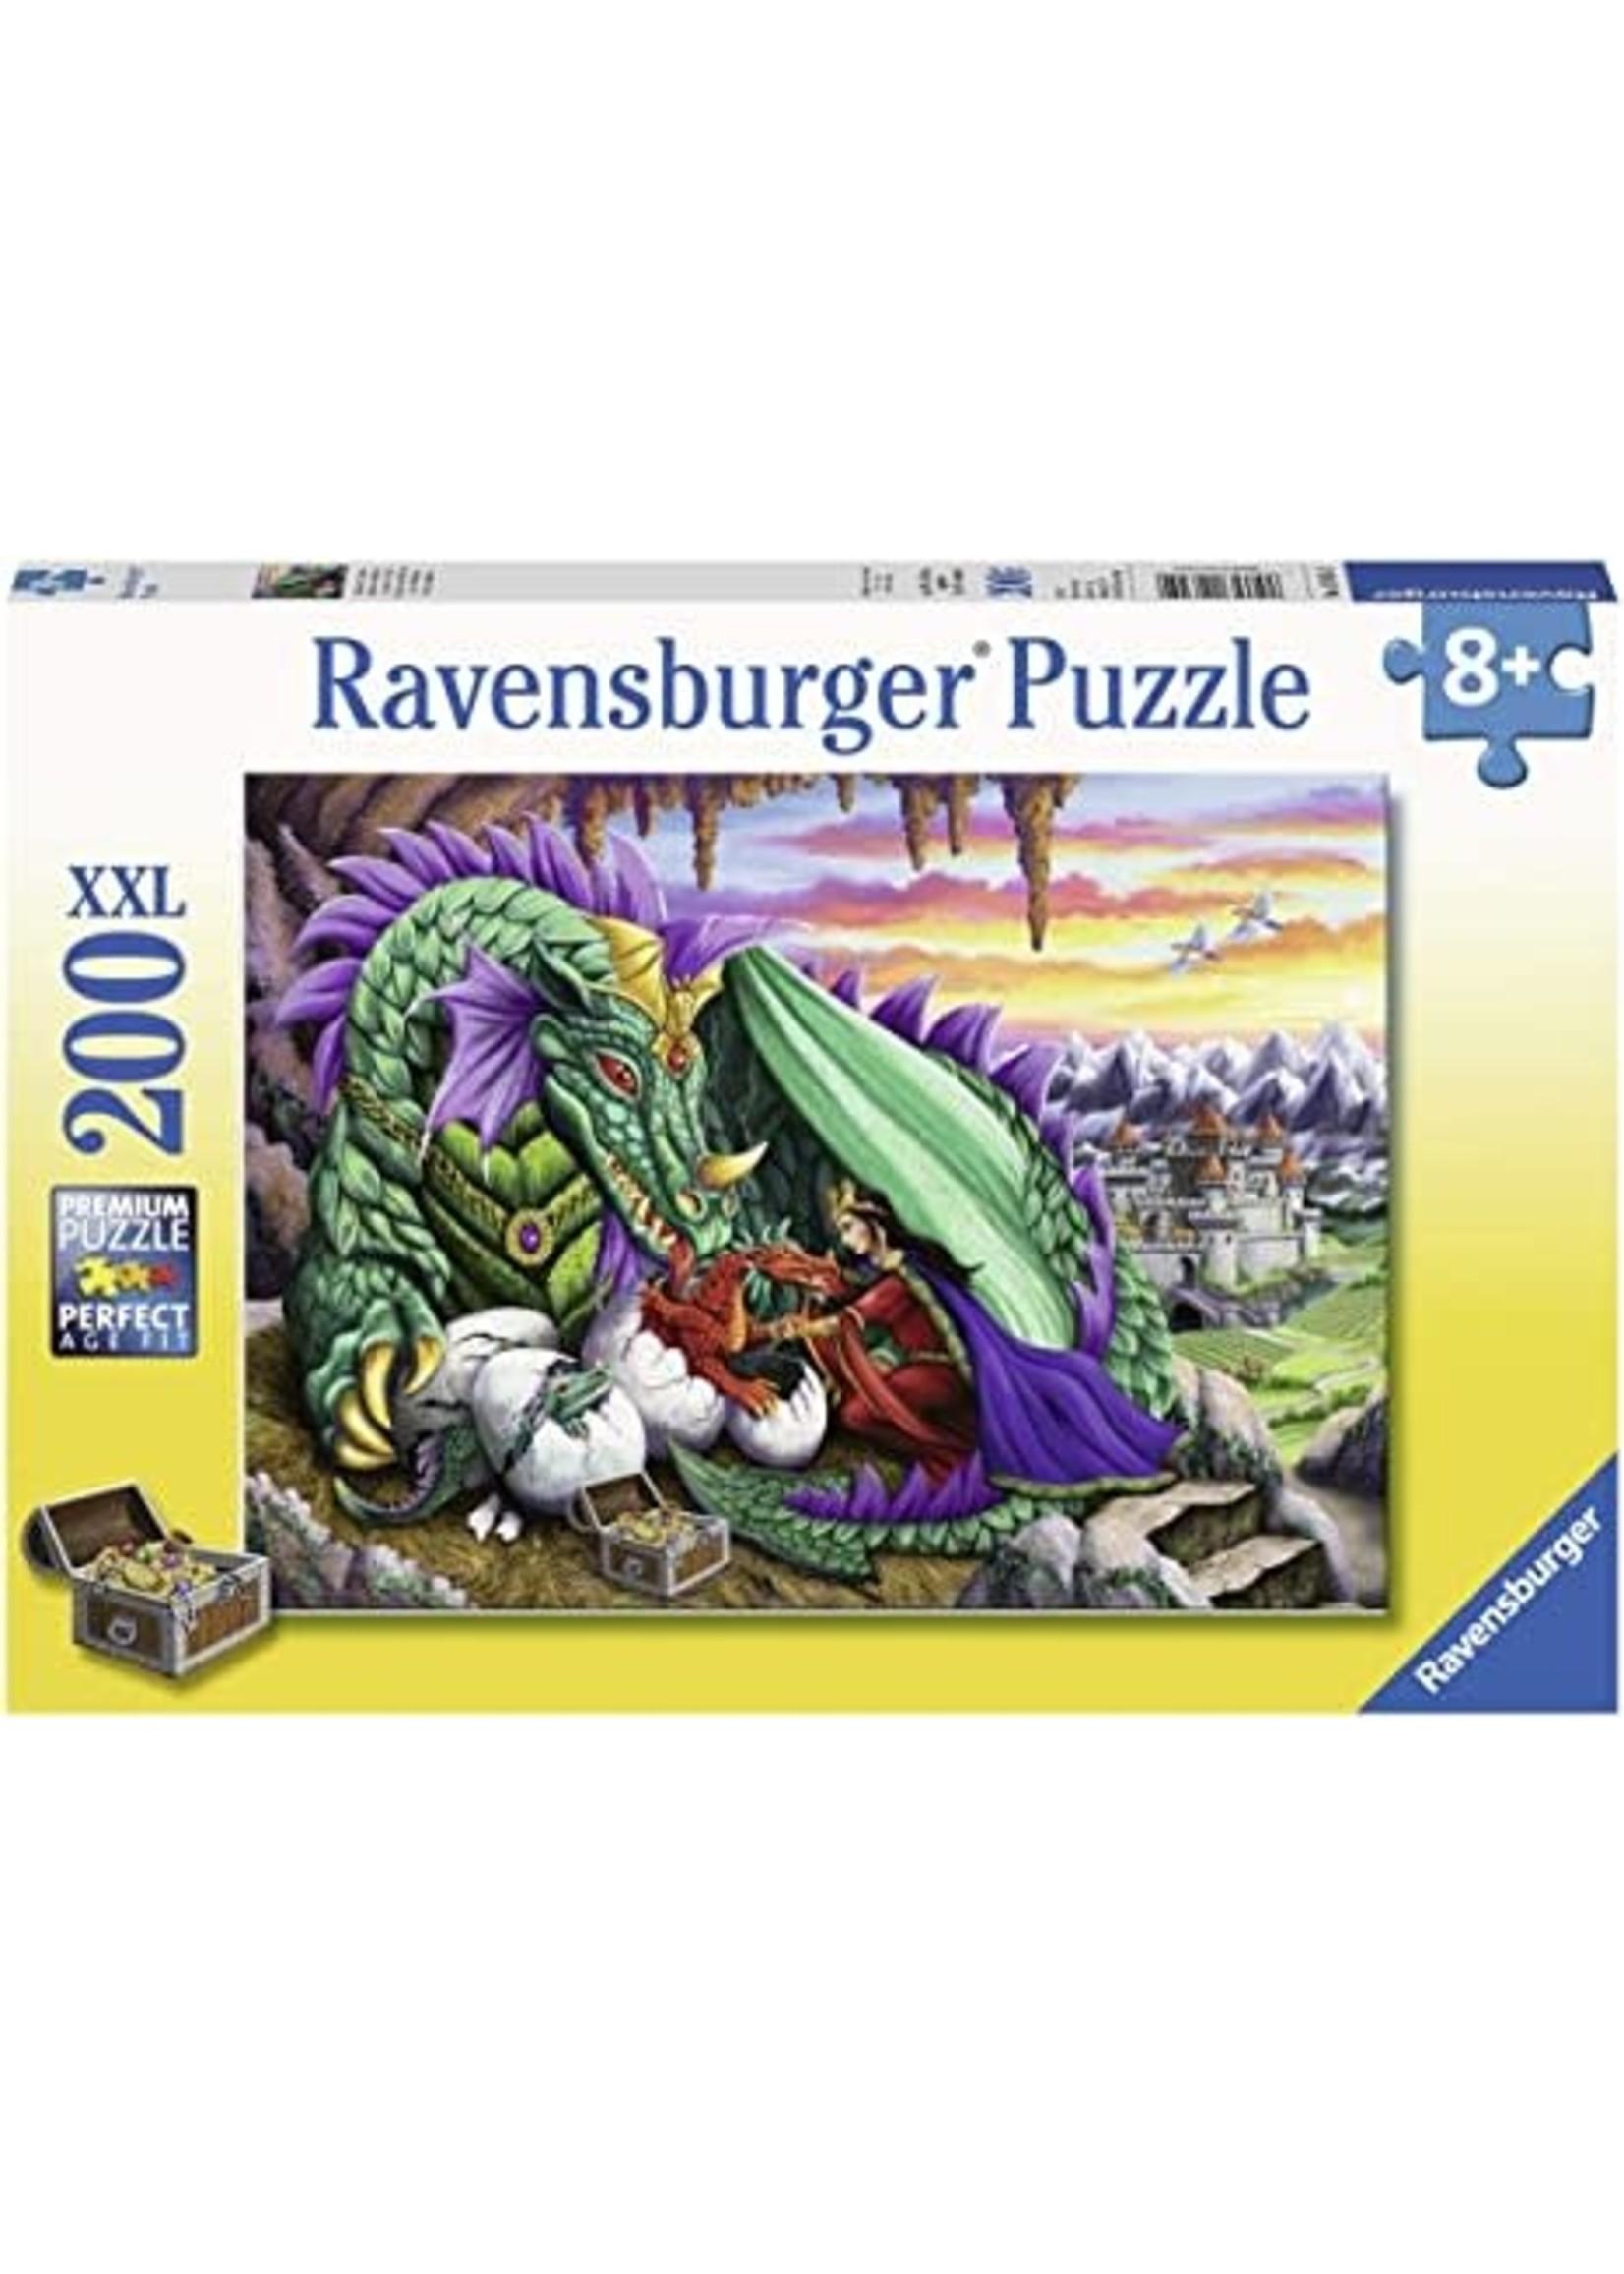 Ravensburger 200pc XXL puzzle Queen Dragons